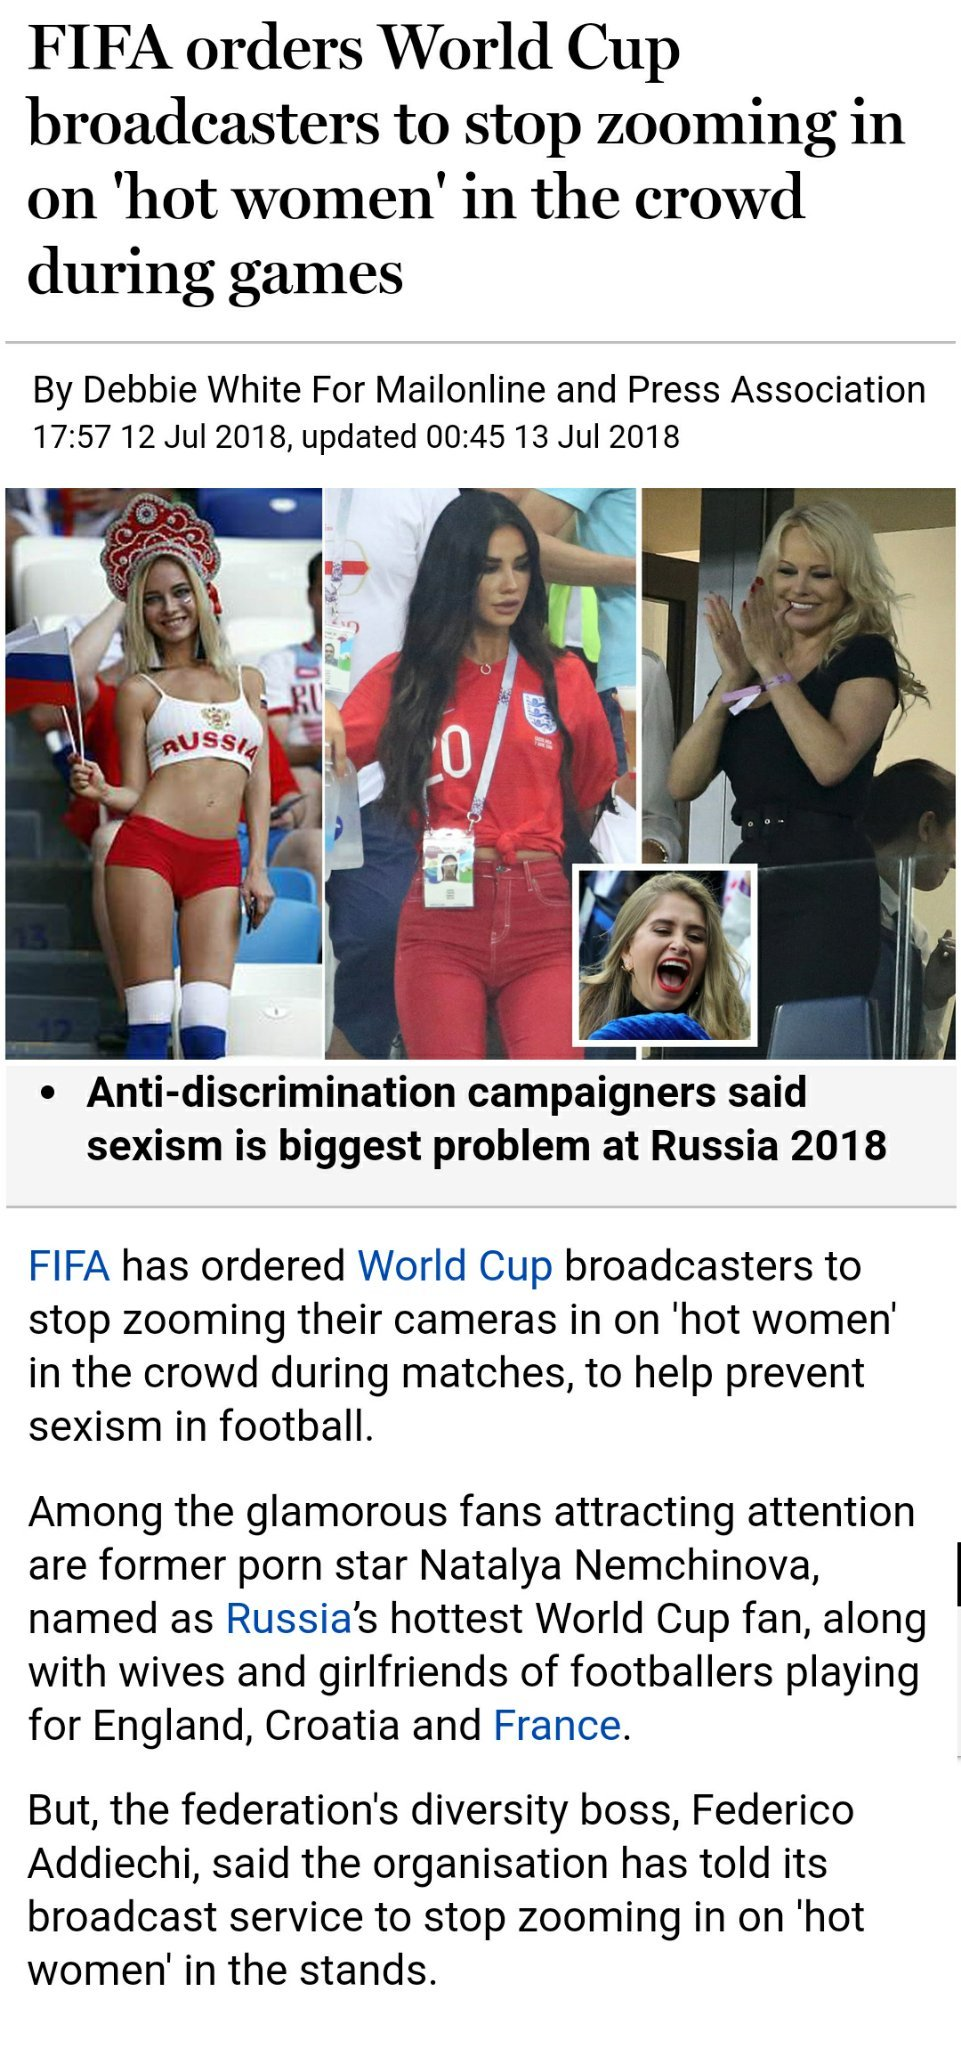 This Is Real You Did It Again Modern Feminism Meme By Adirbal